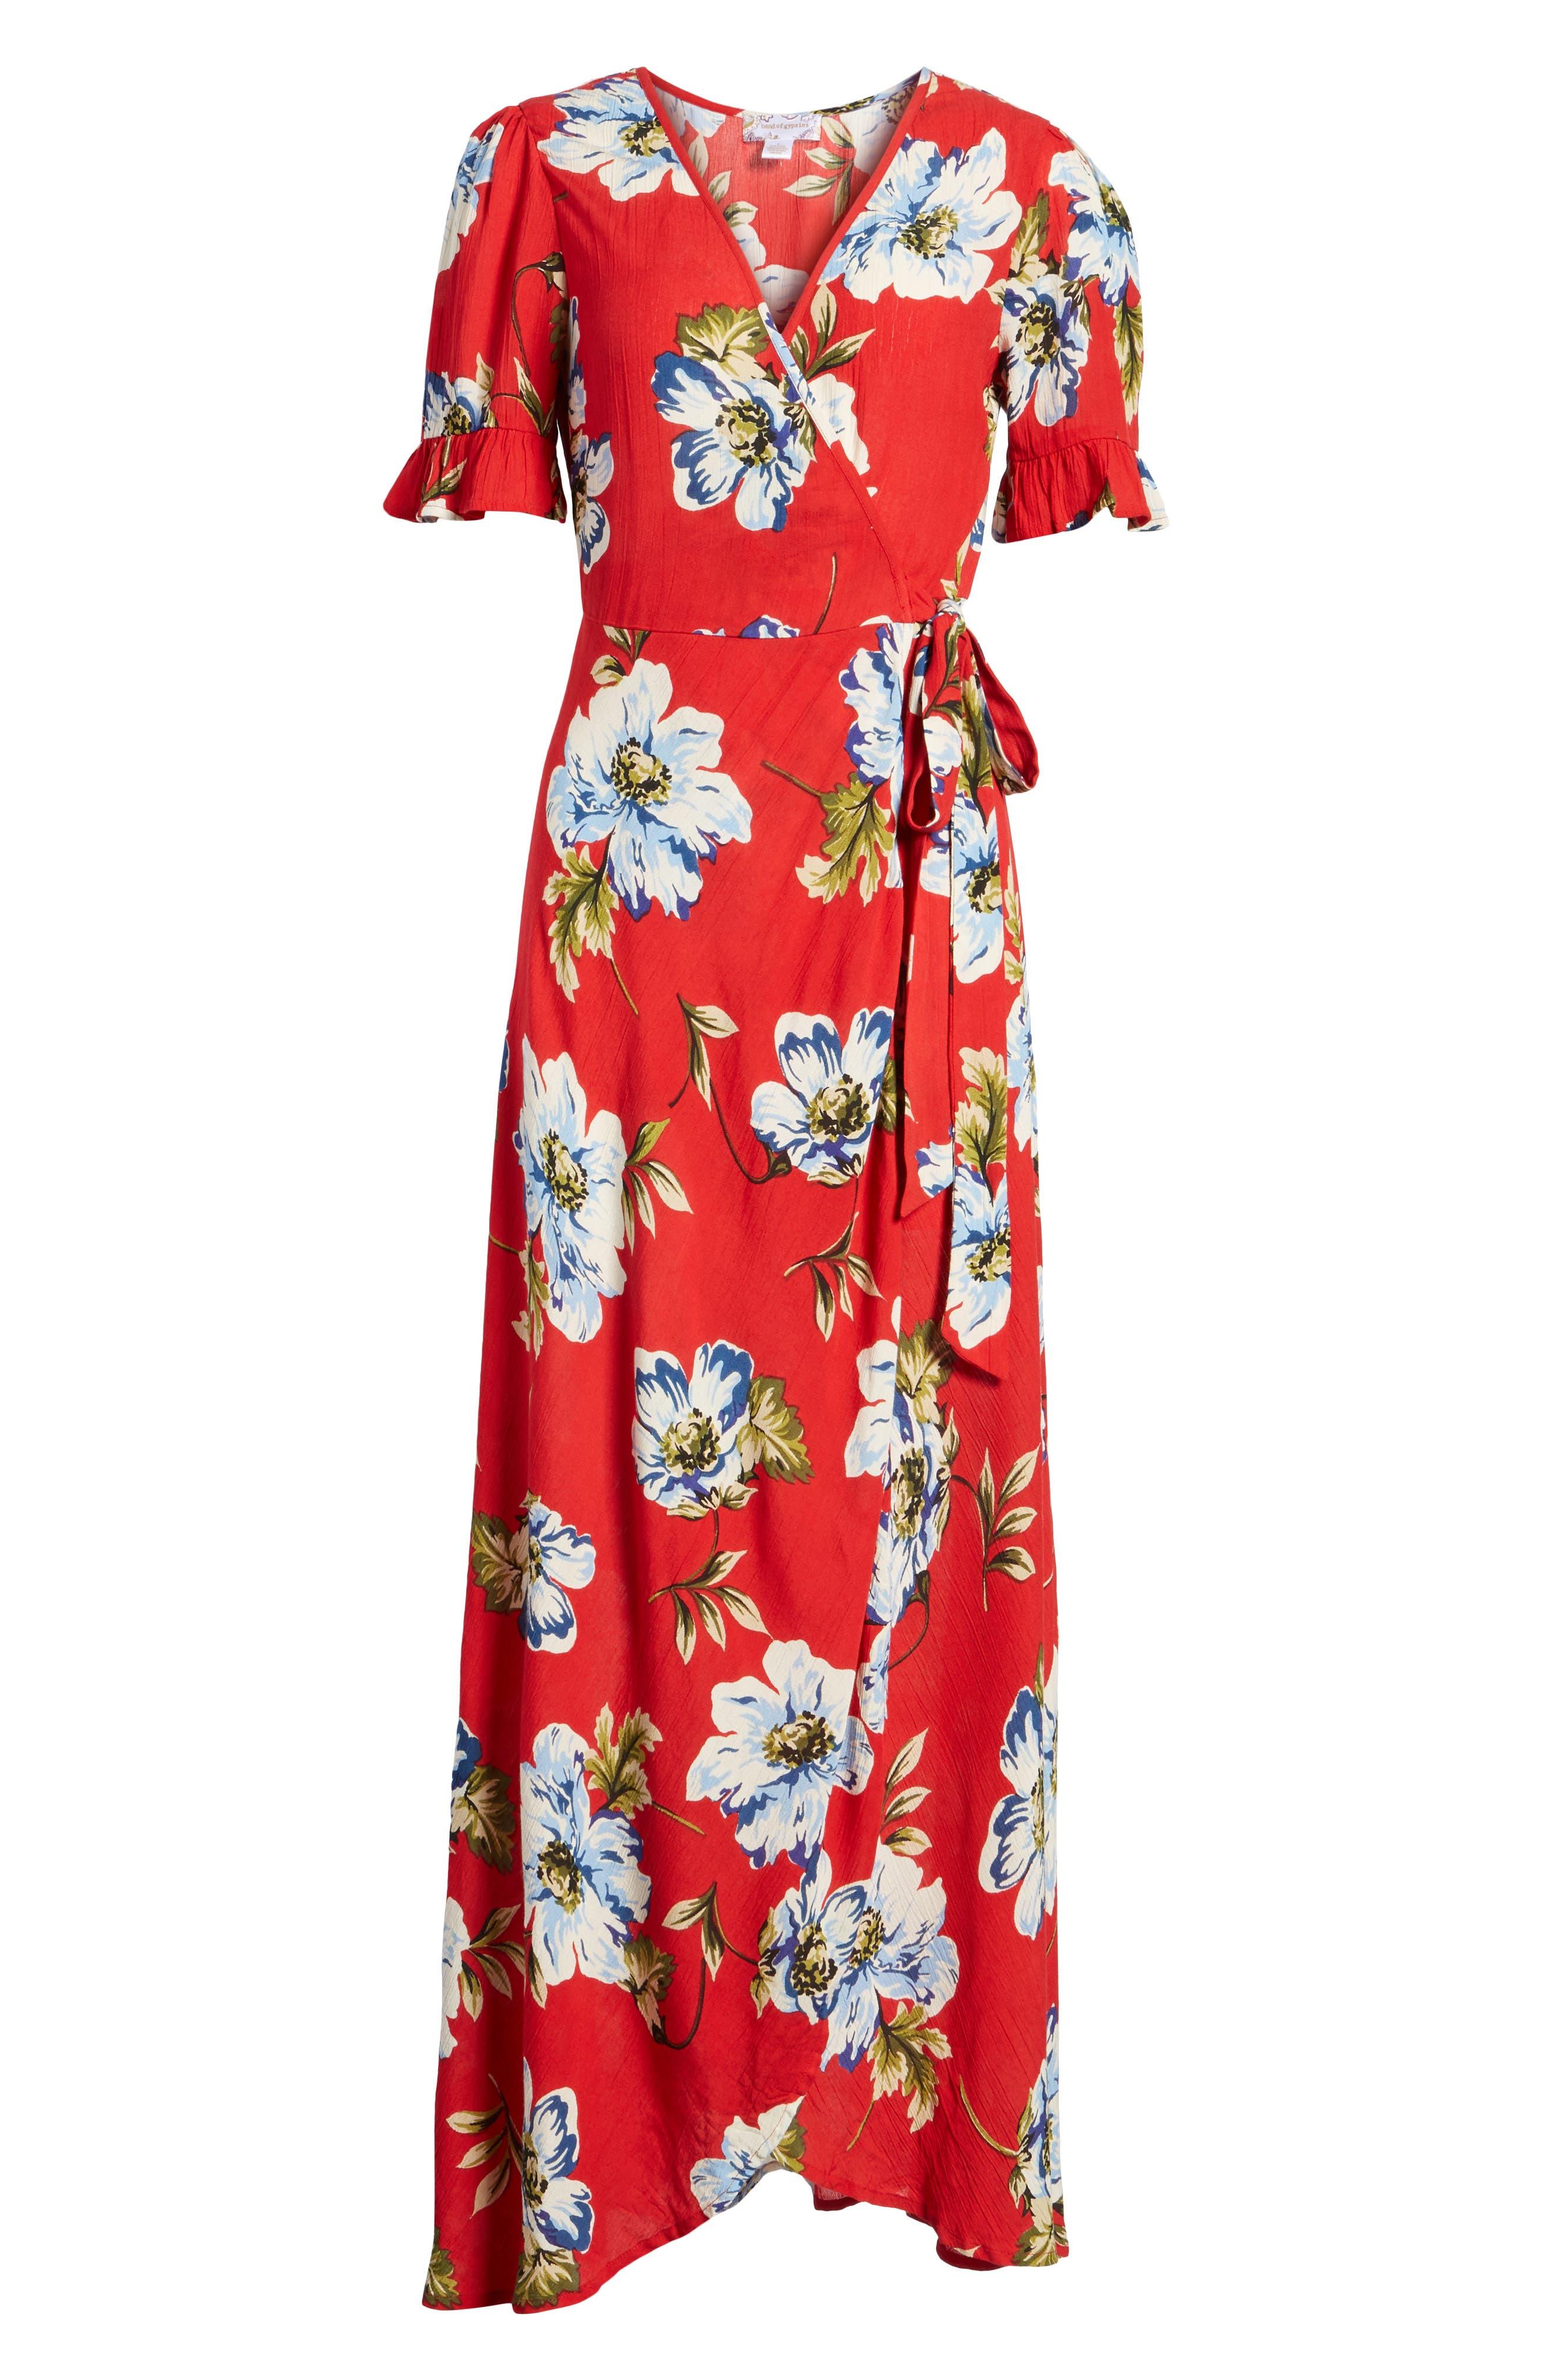 Blue Moon Floral Print Wrap Dress,                             Alternate thumbnail 7, color,                             Red/ Sky